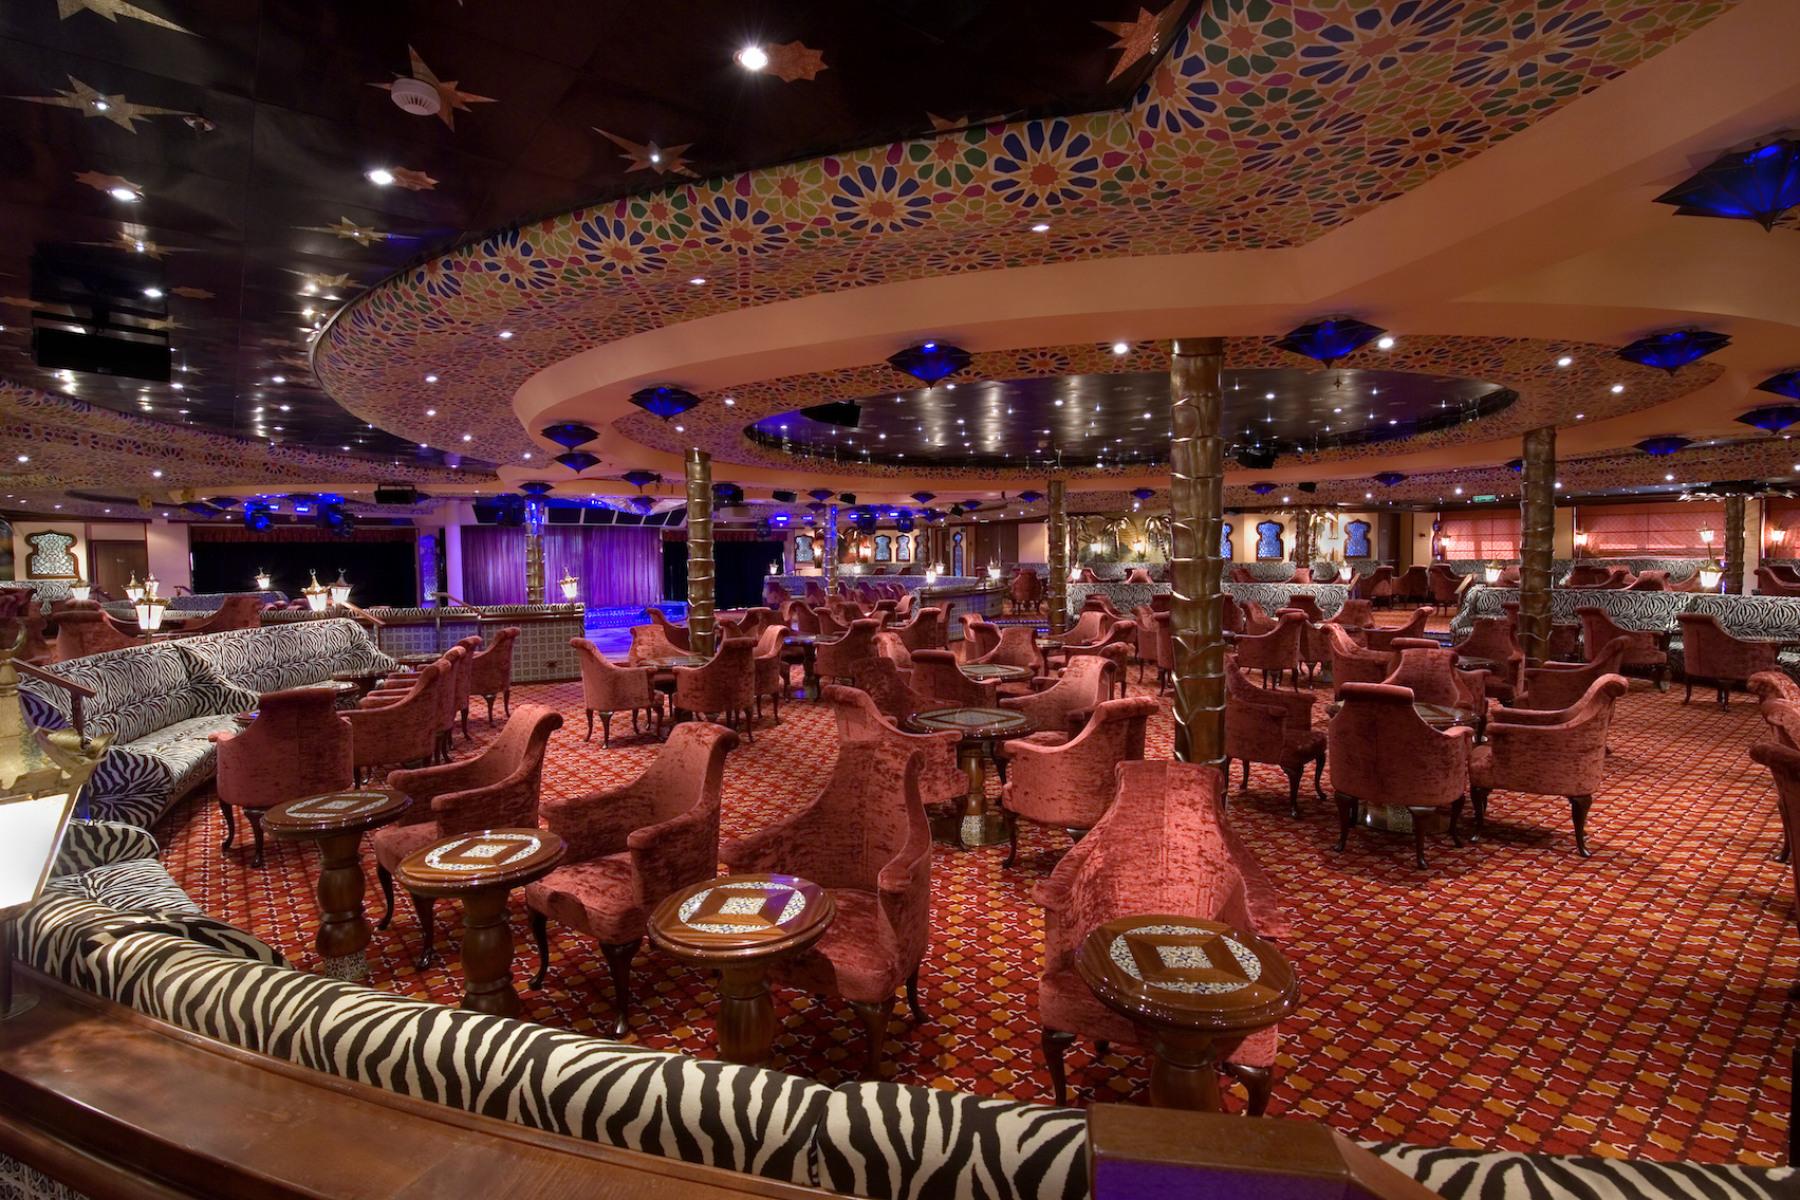 Carnival Splendor El Moroccan Lounge 1.jpg